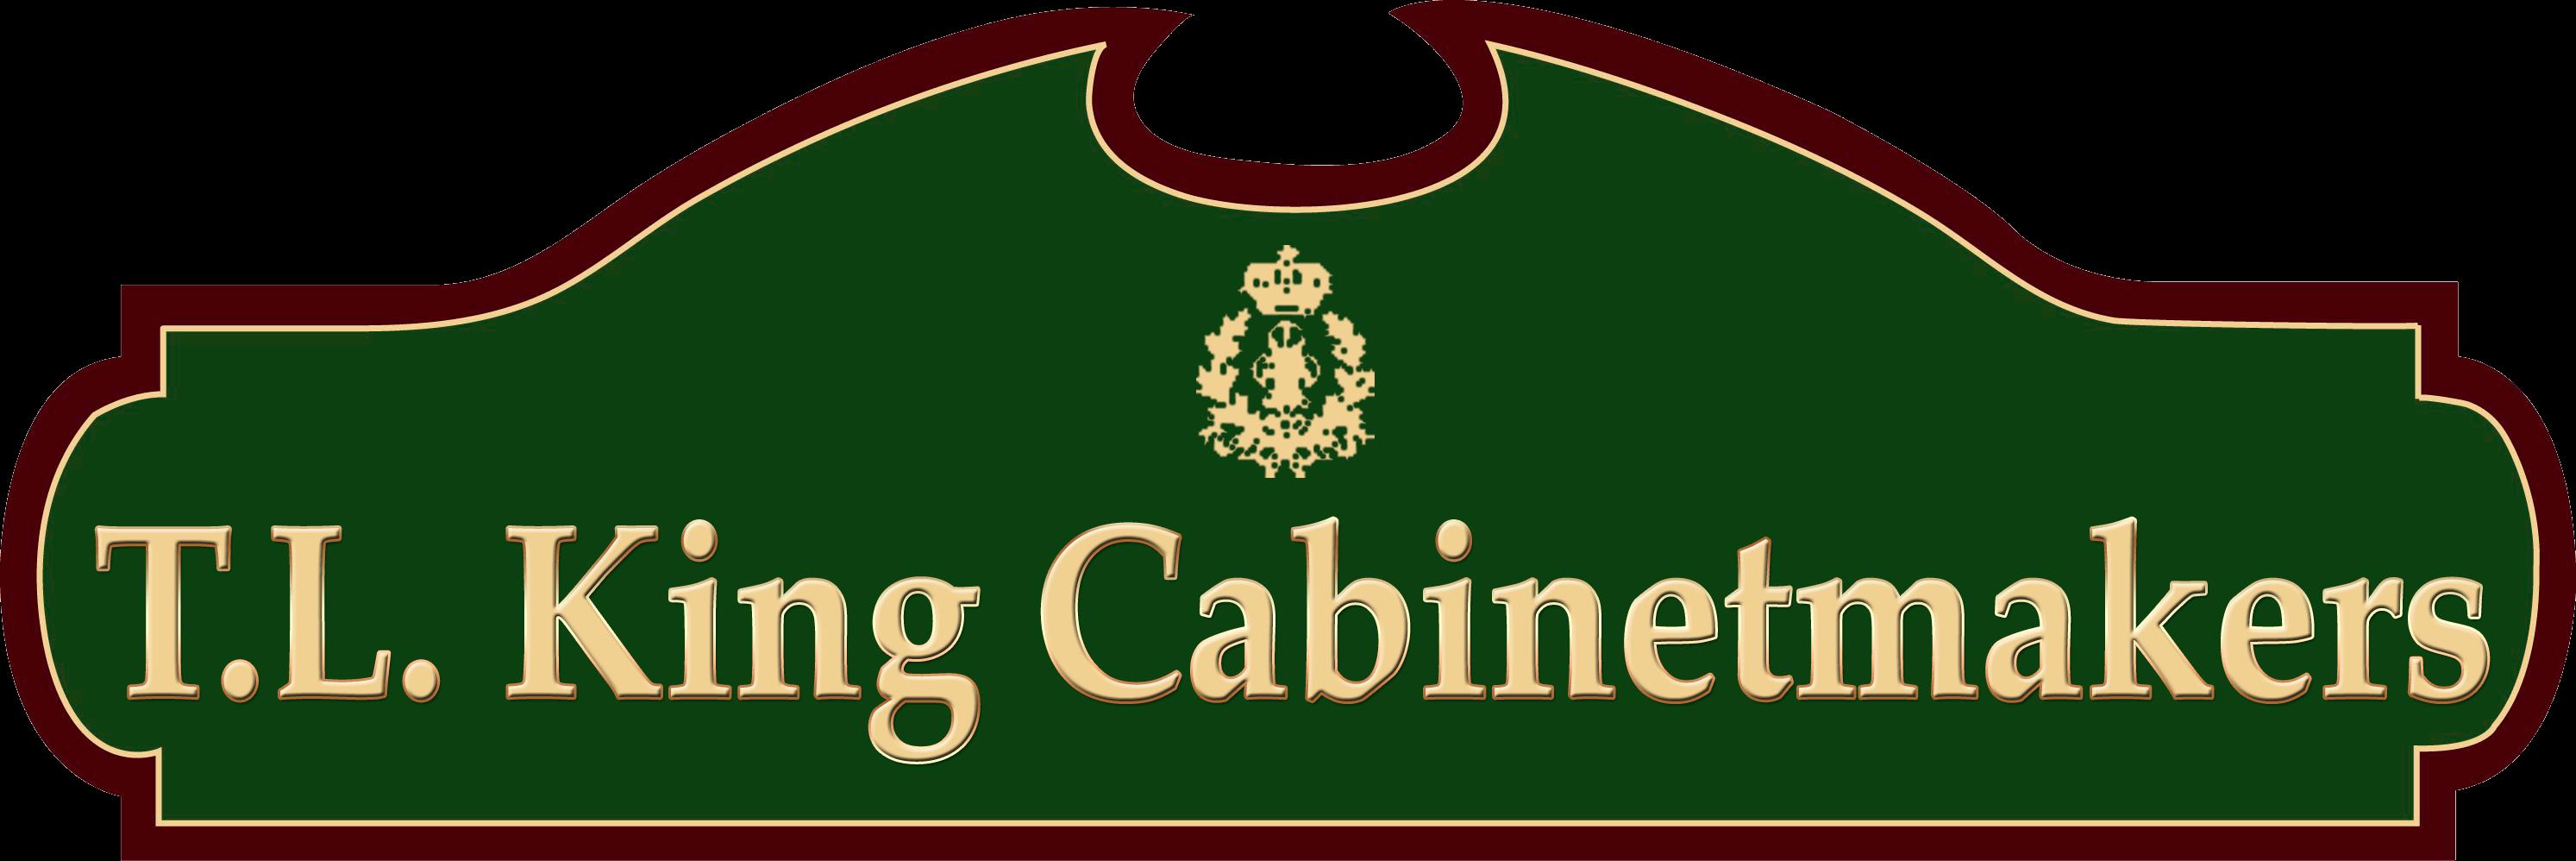 TL King Cabinetmakers LLC Logo